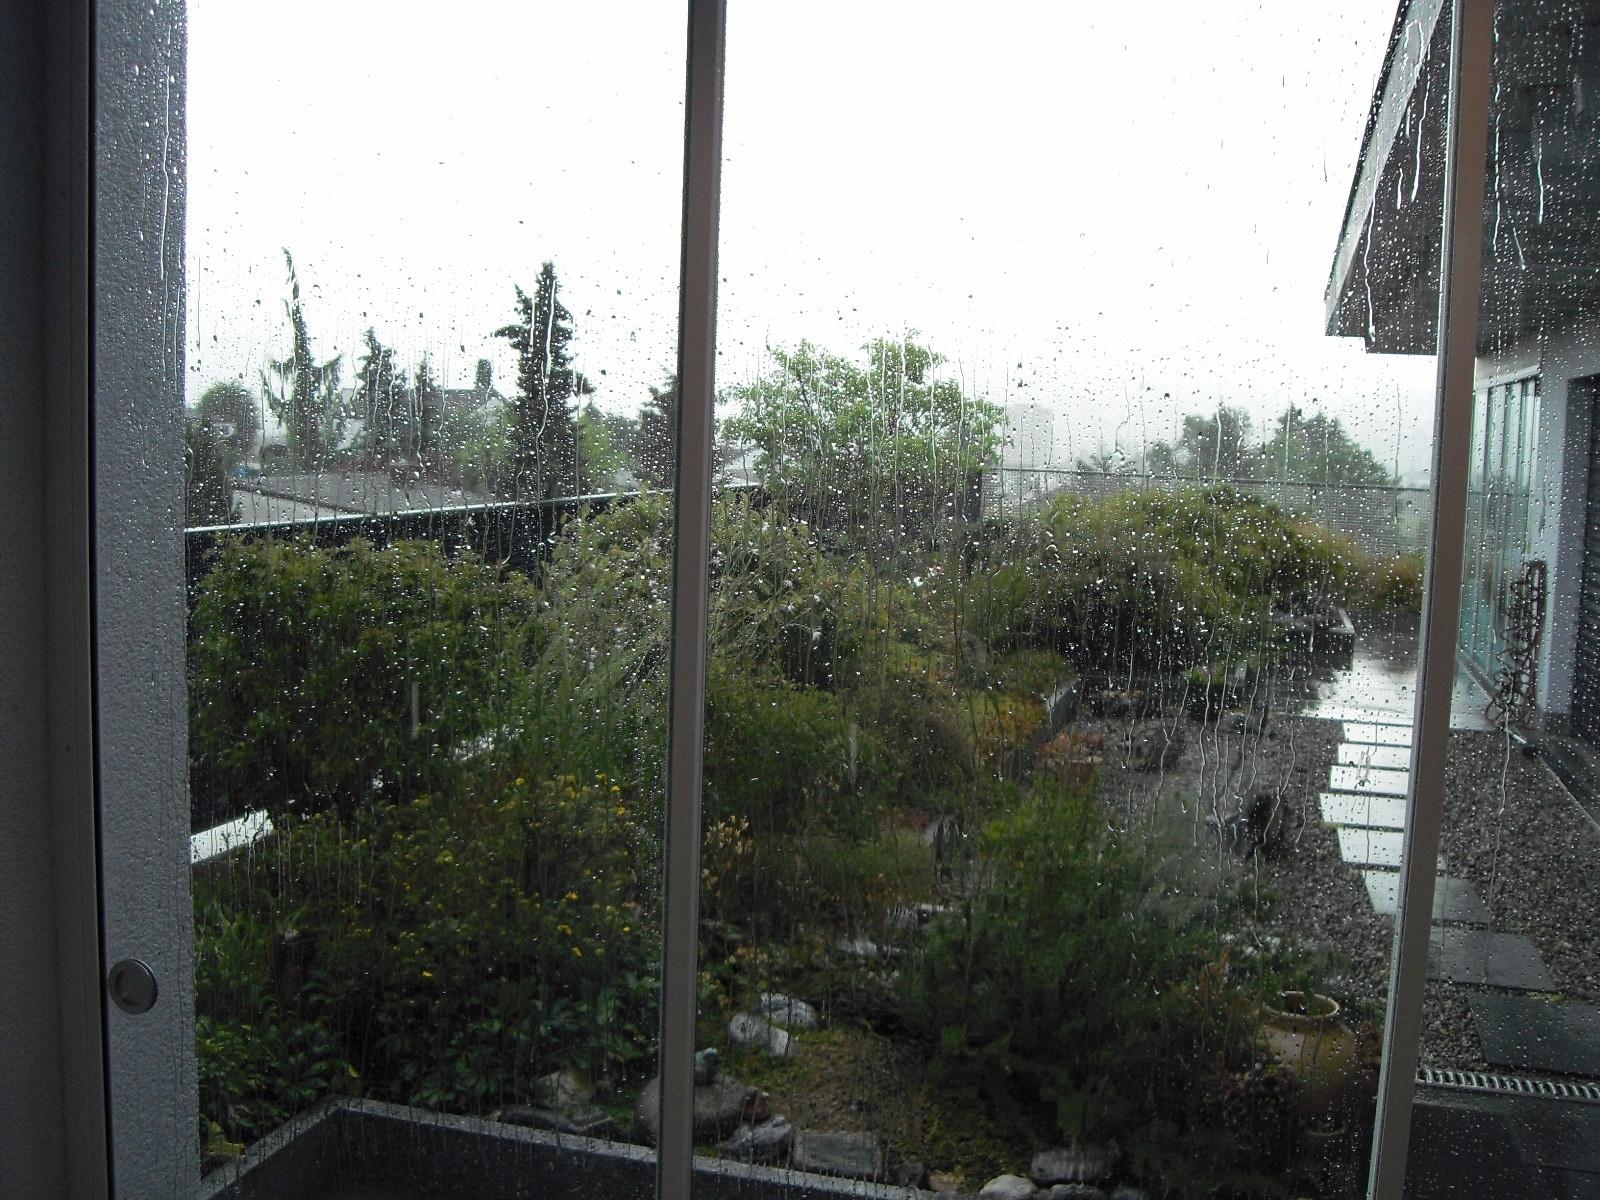 Juli / Willkommener Regen ... 1